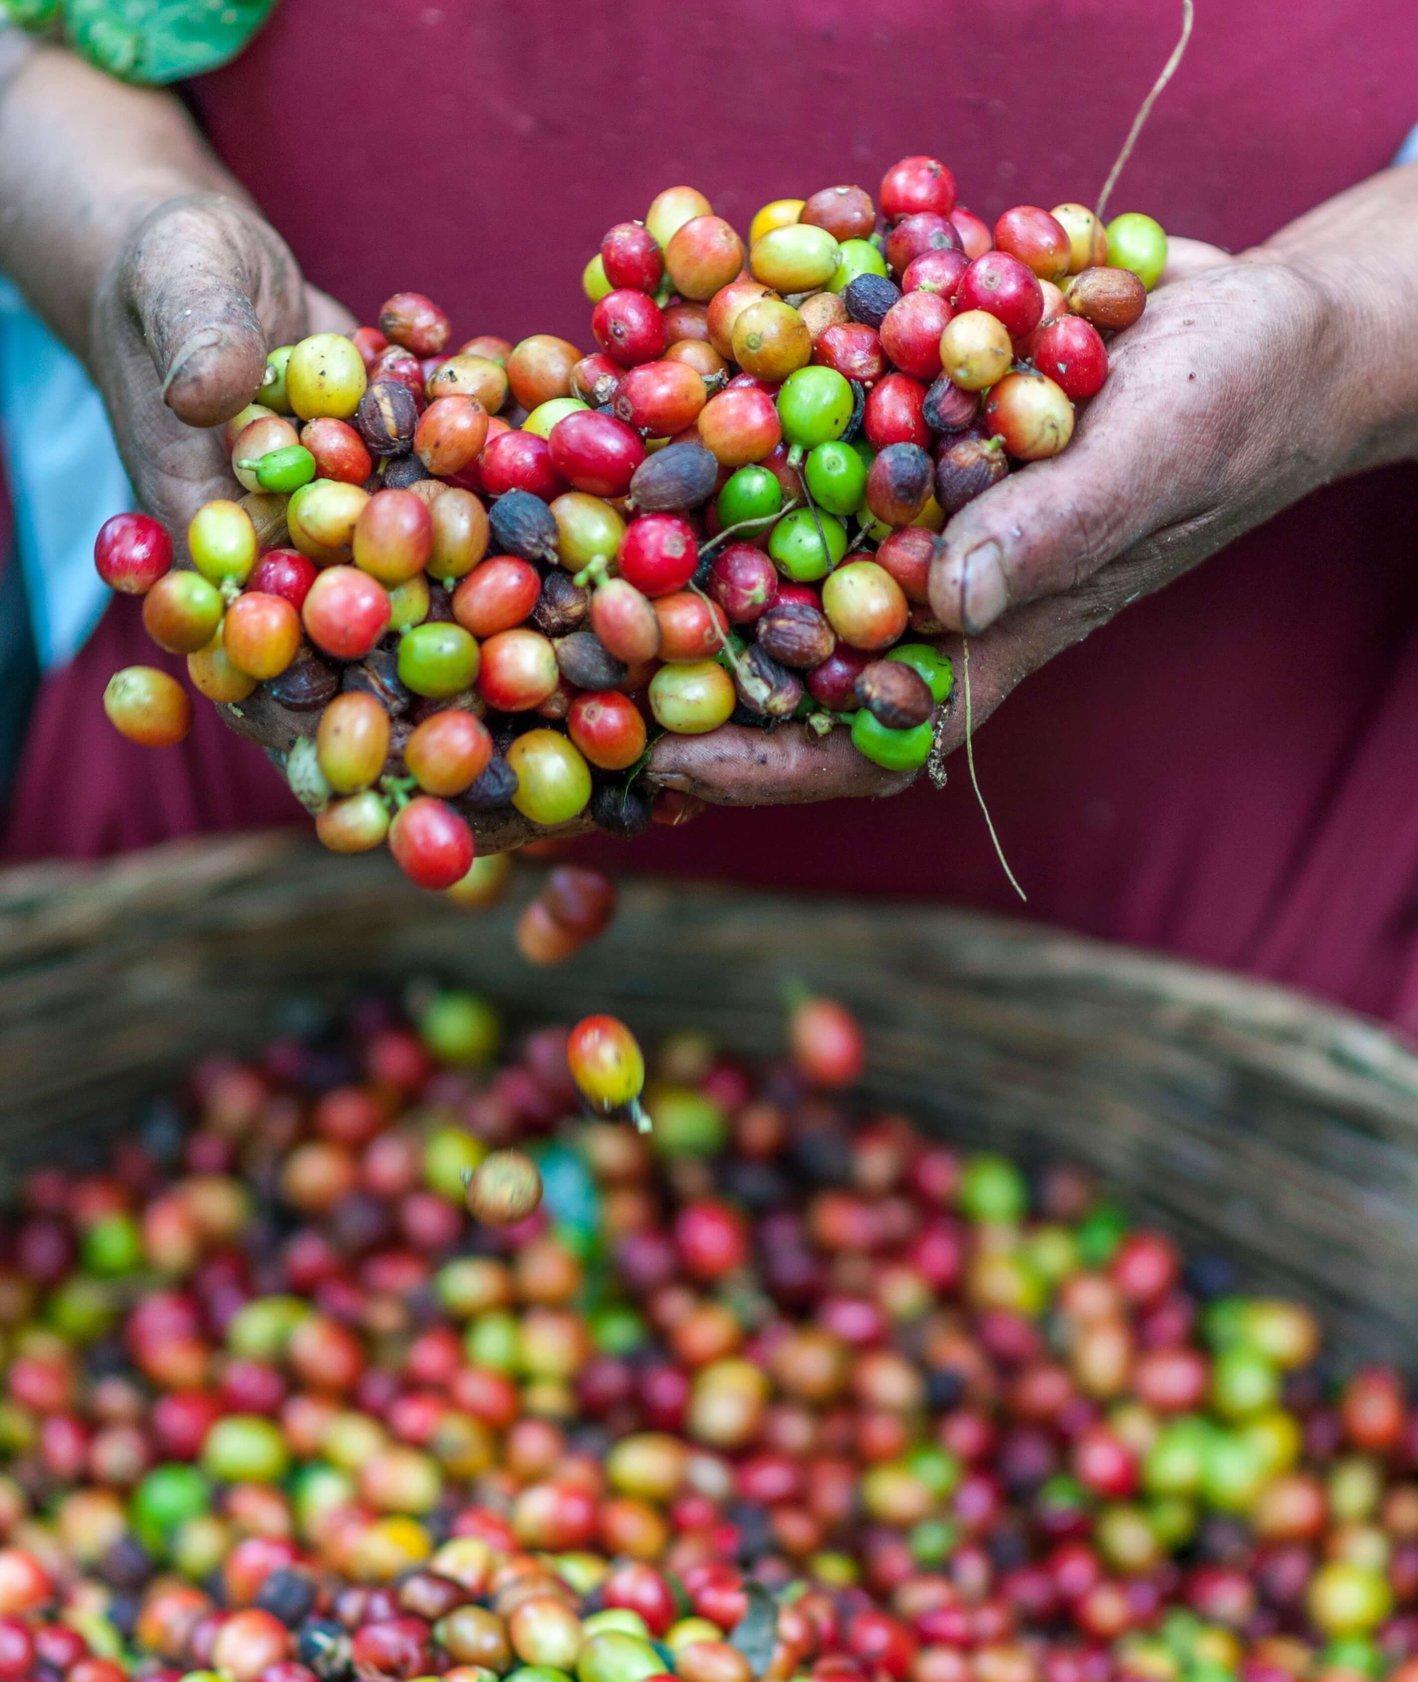 Owoce kawowca (fot. Rodrigo Flores / unsplash.com)